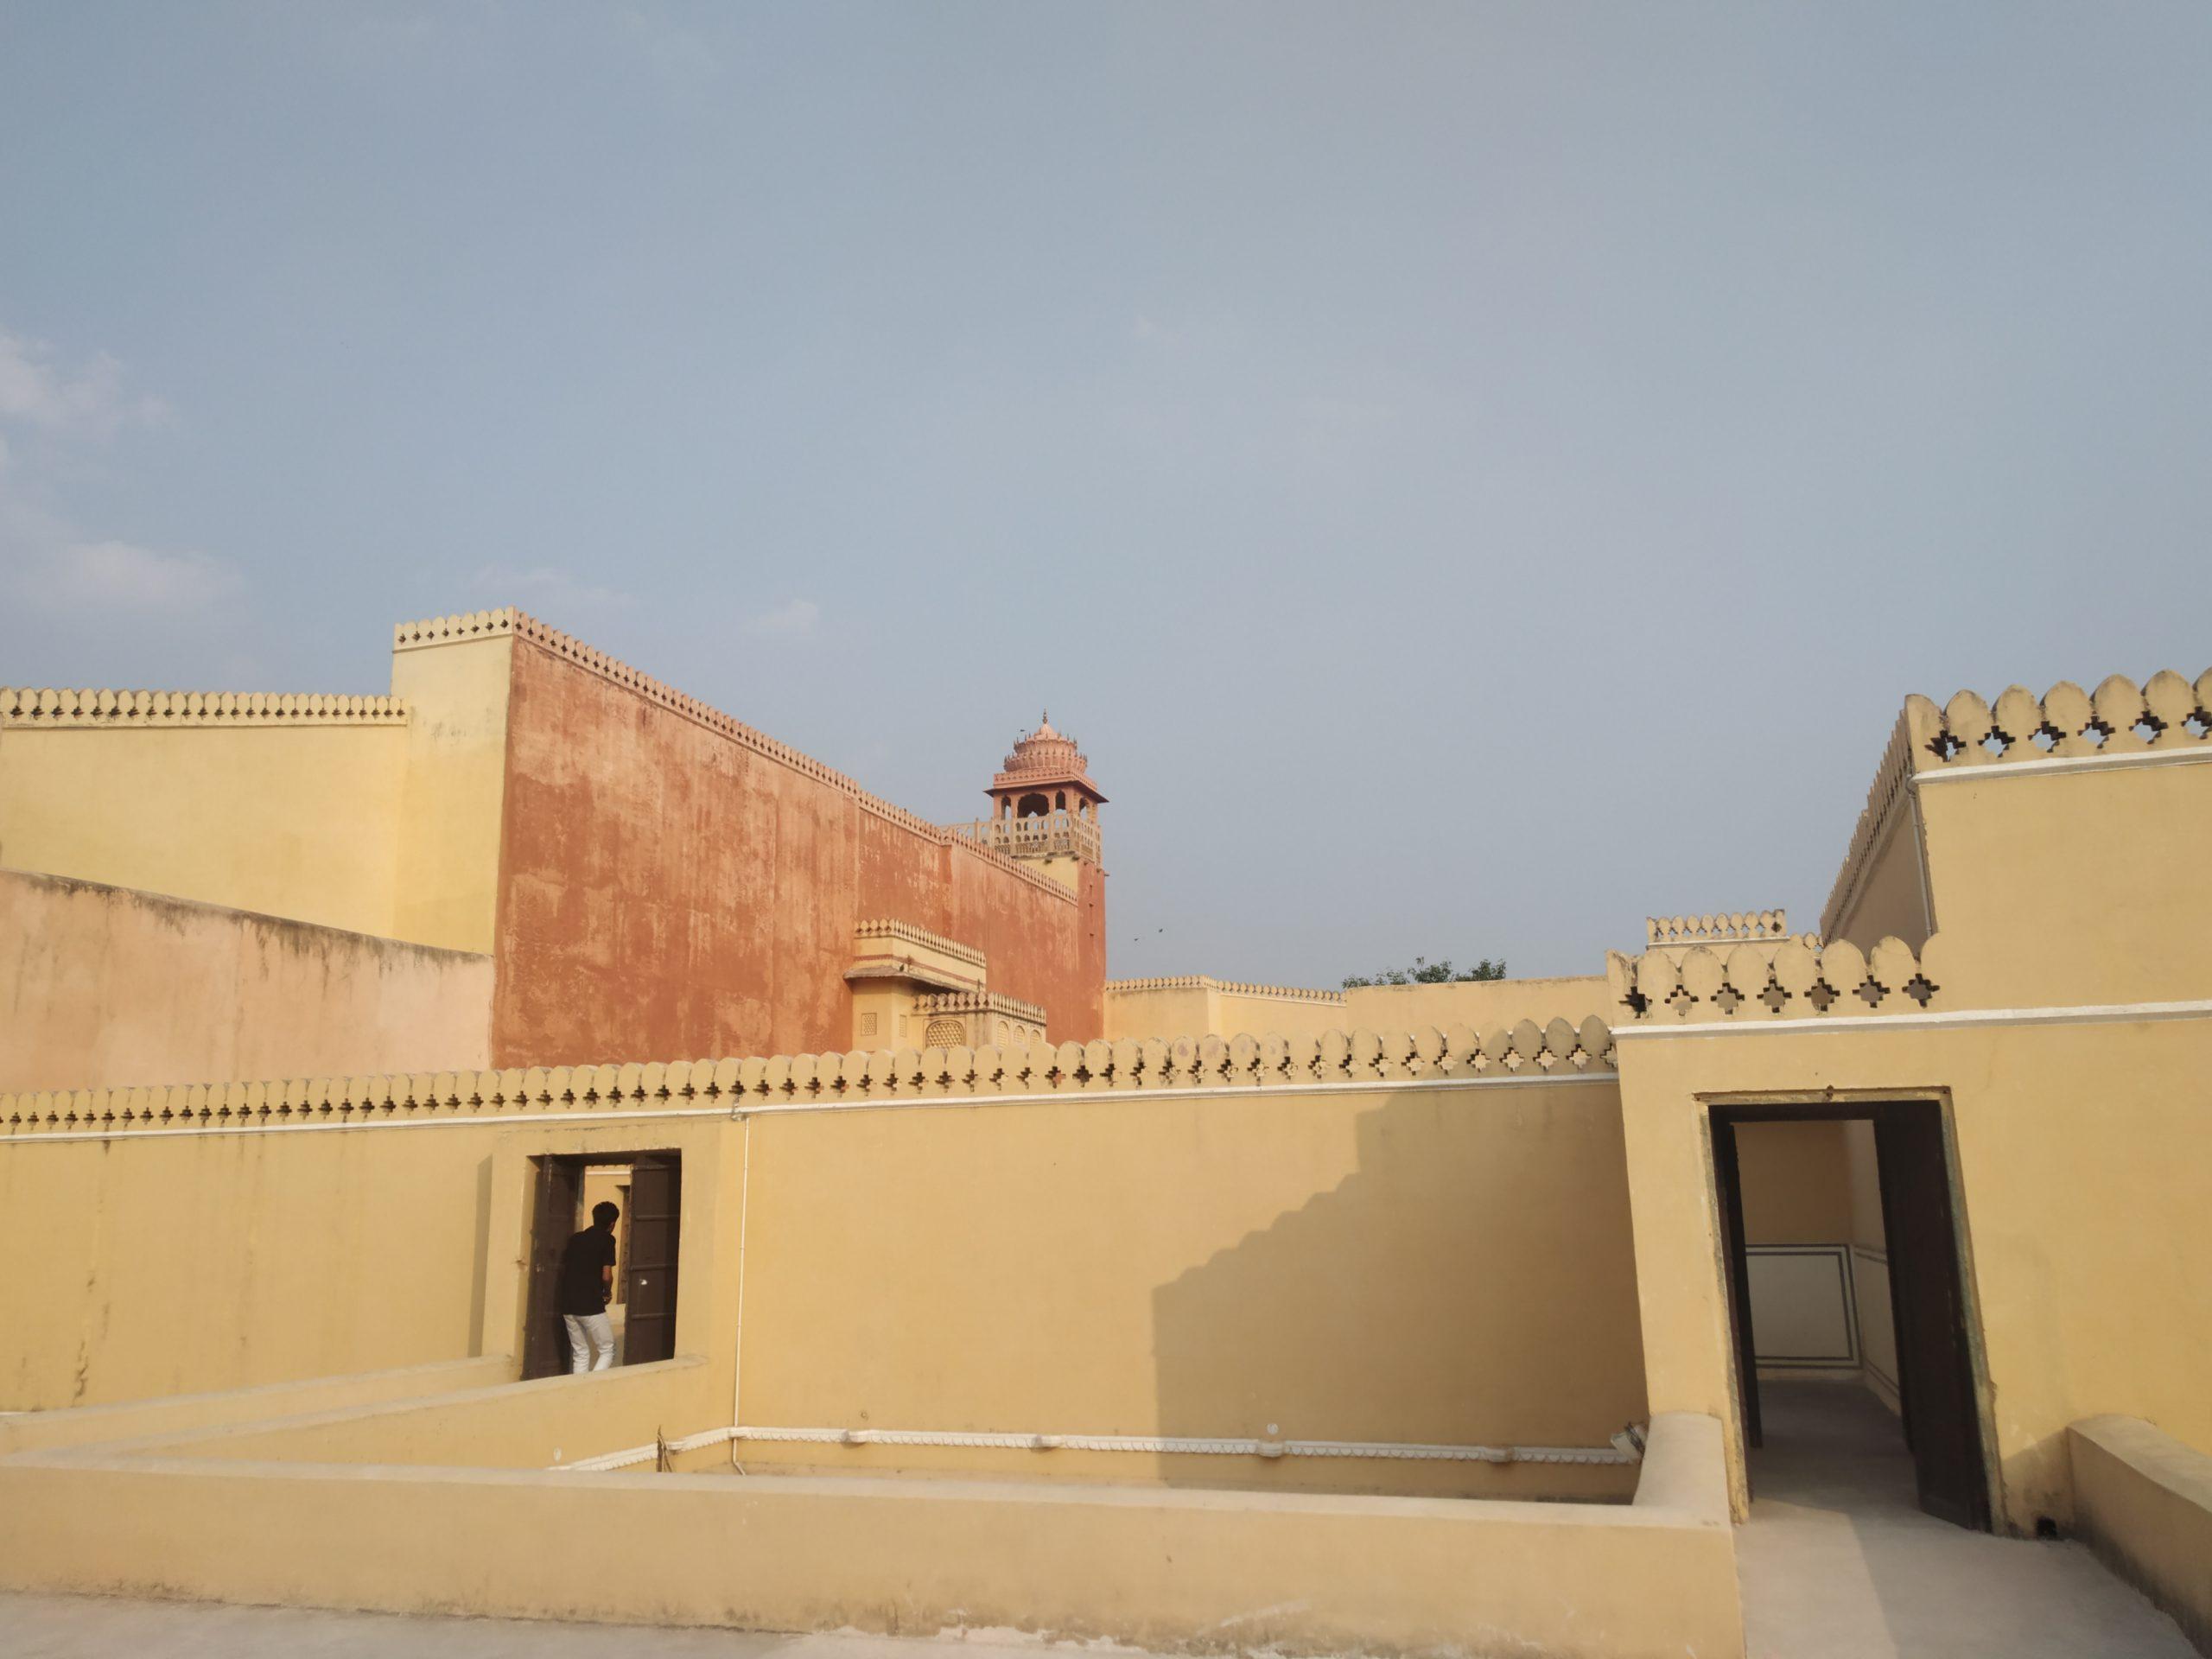 Hawamahal in Jaipur